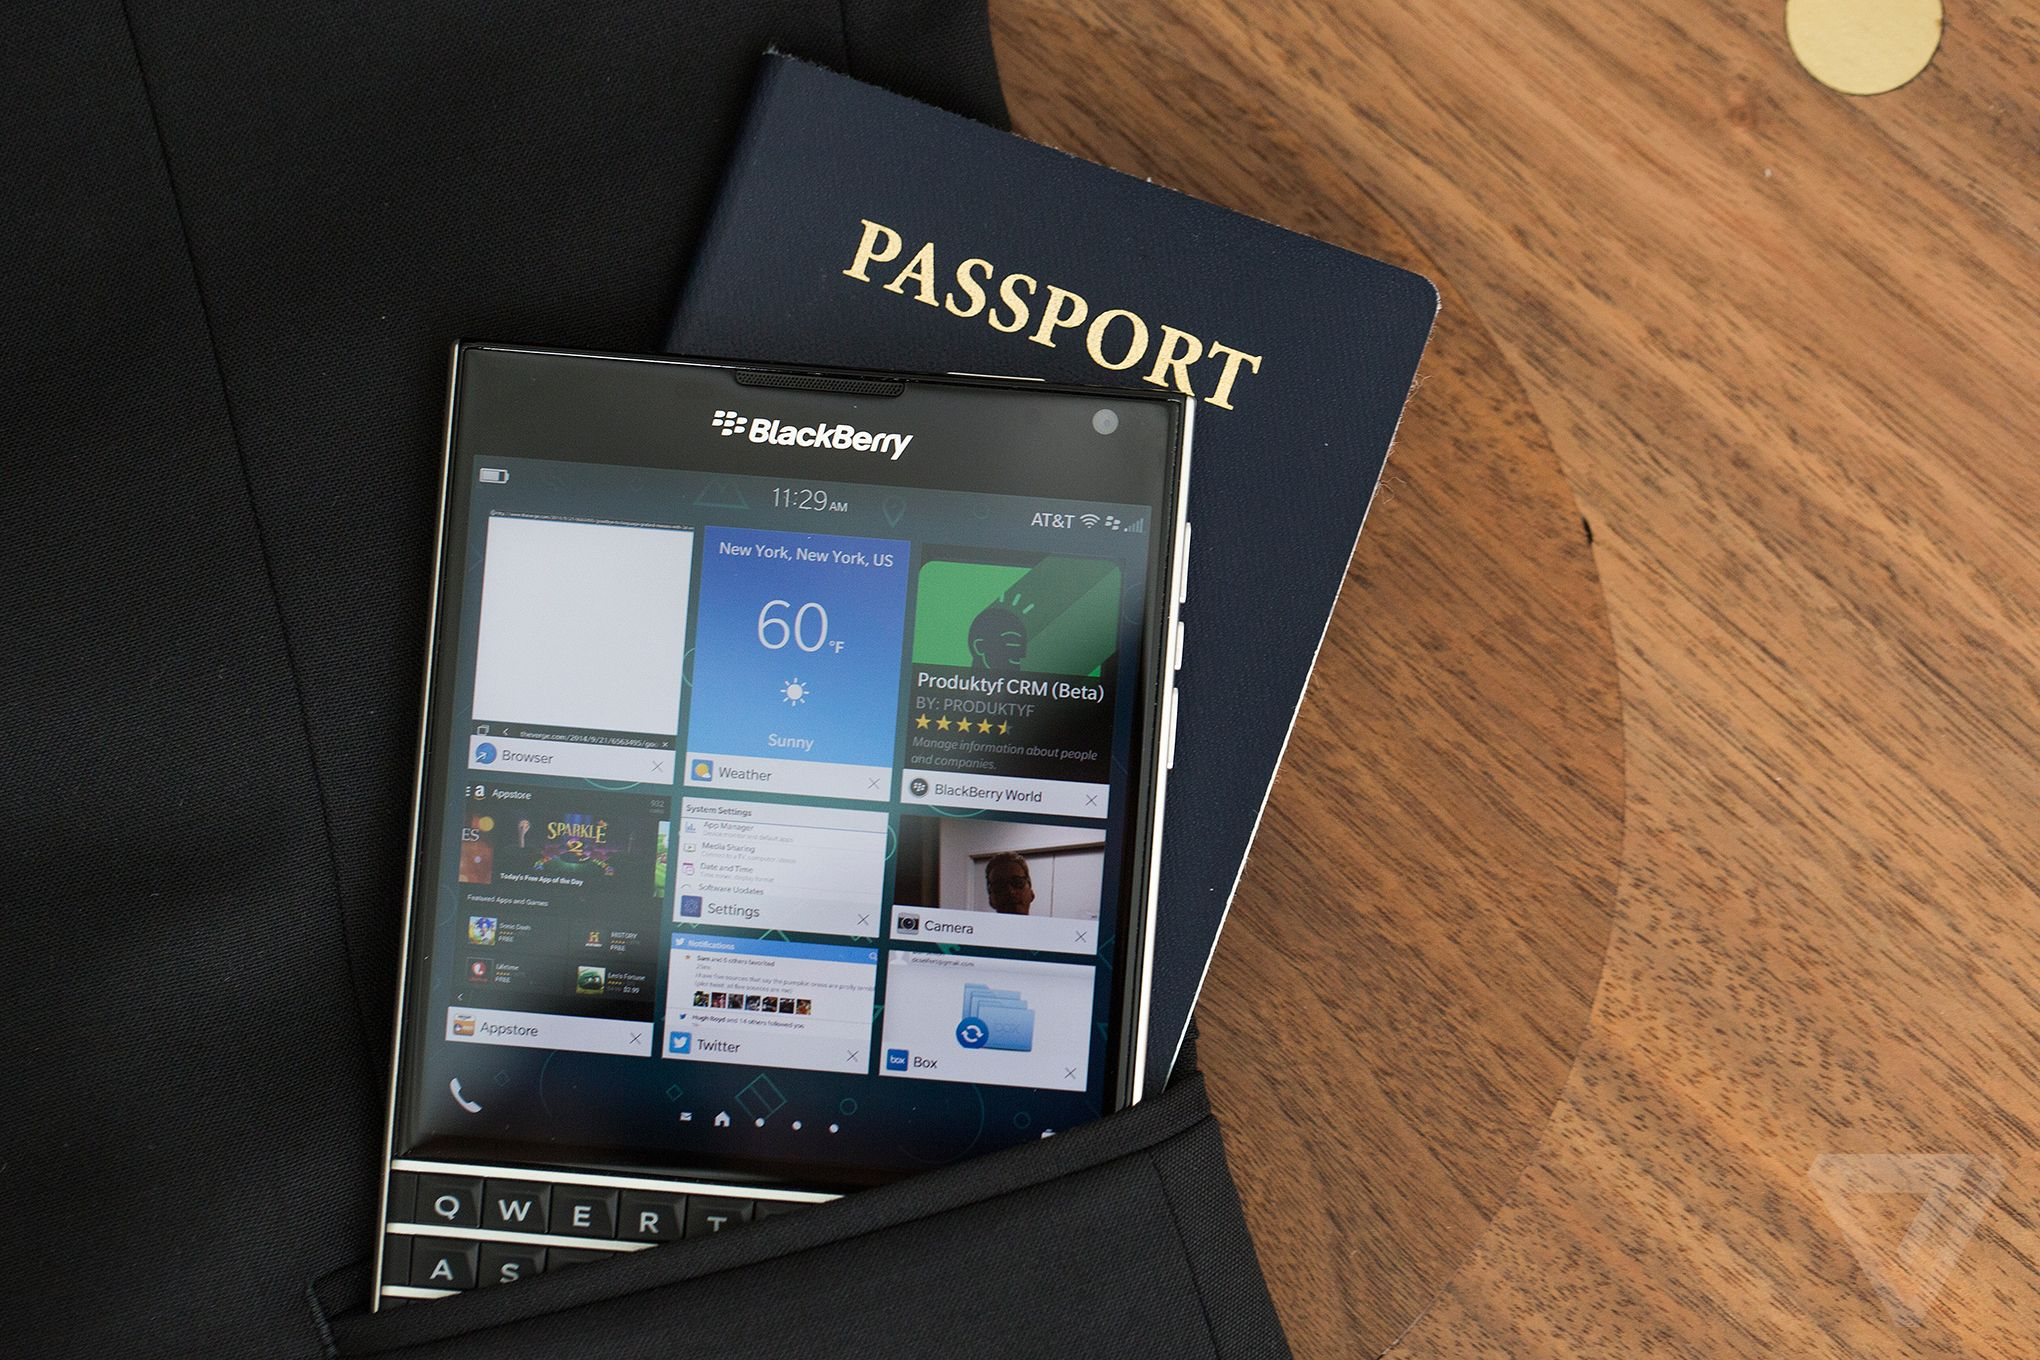 blackberry-passport-specifications